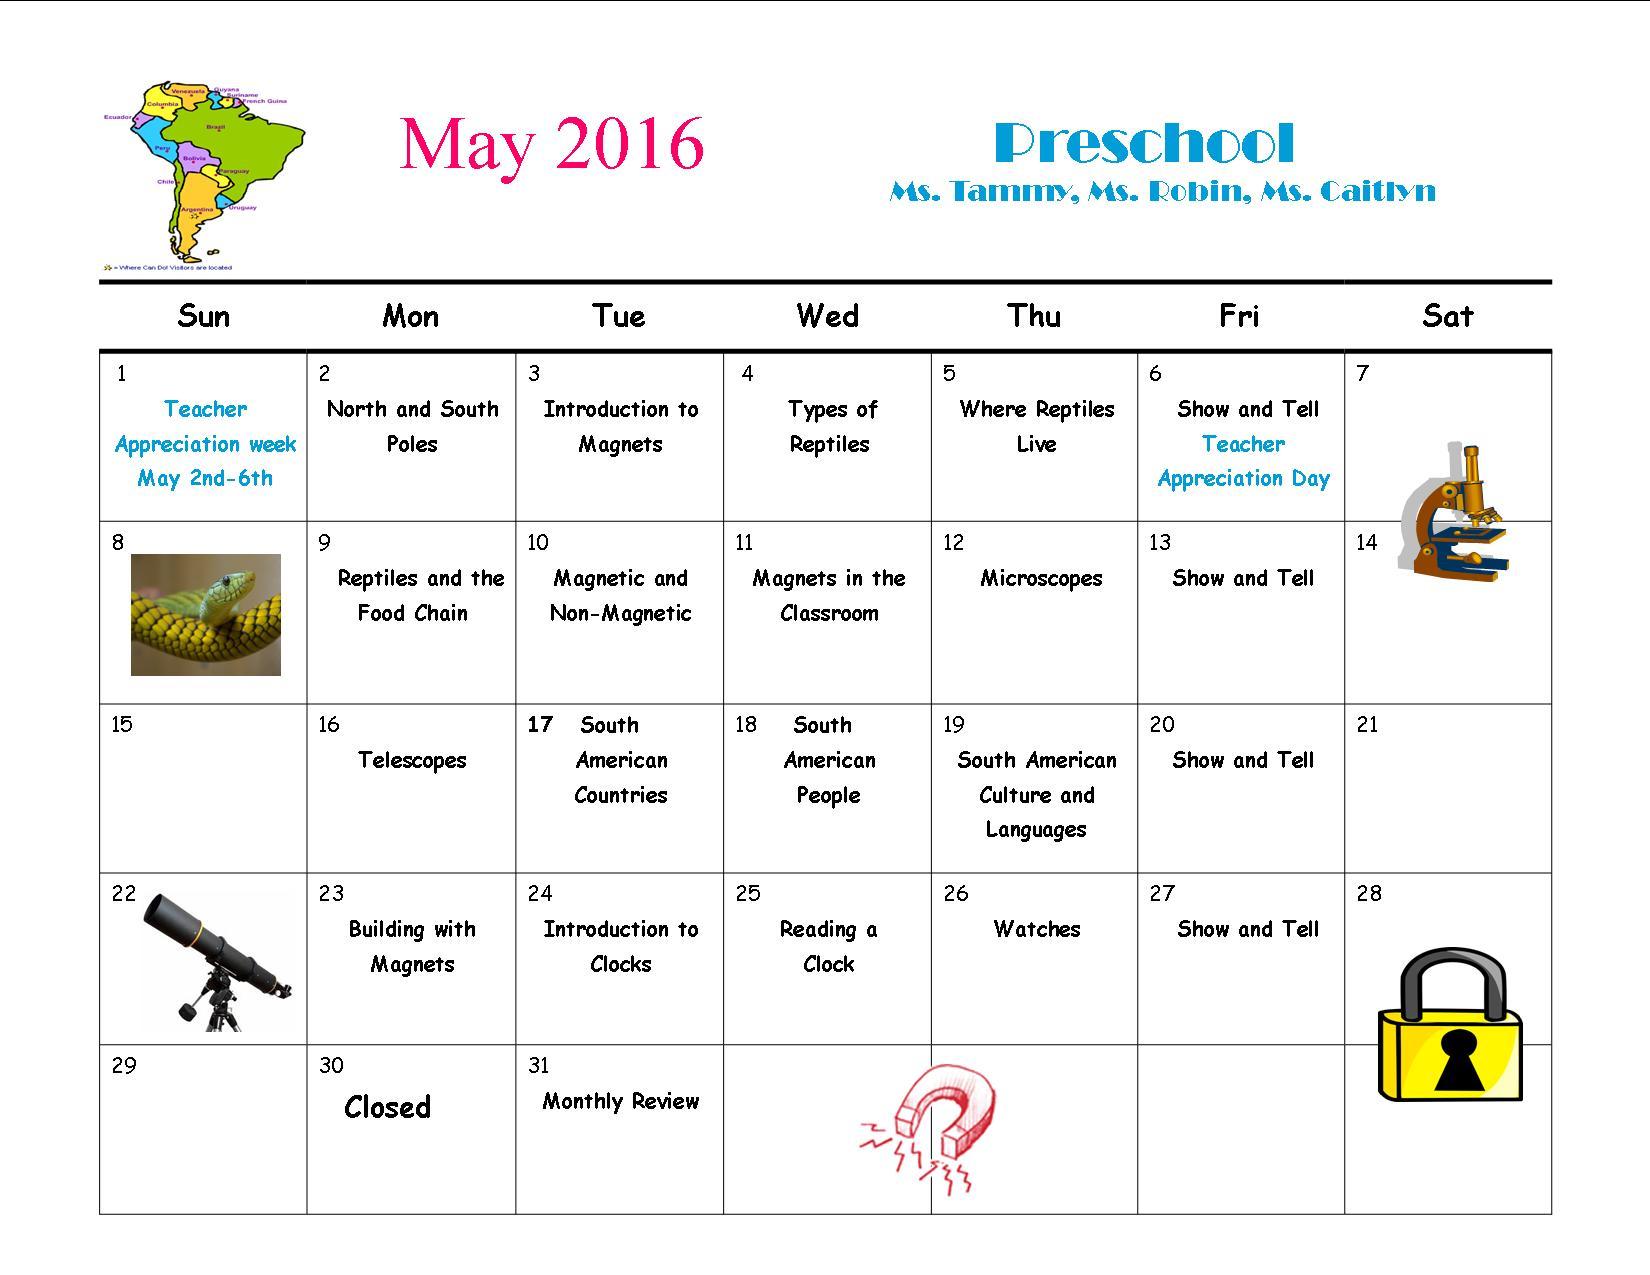 Kindergarten Calendar S S : May calendar university weinacker s montessori